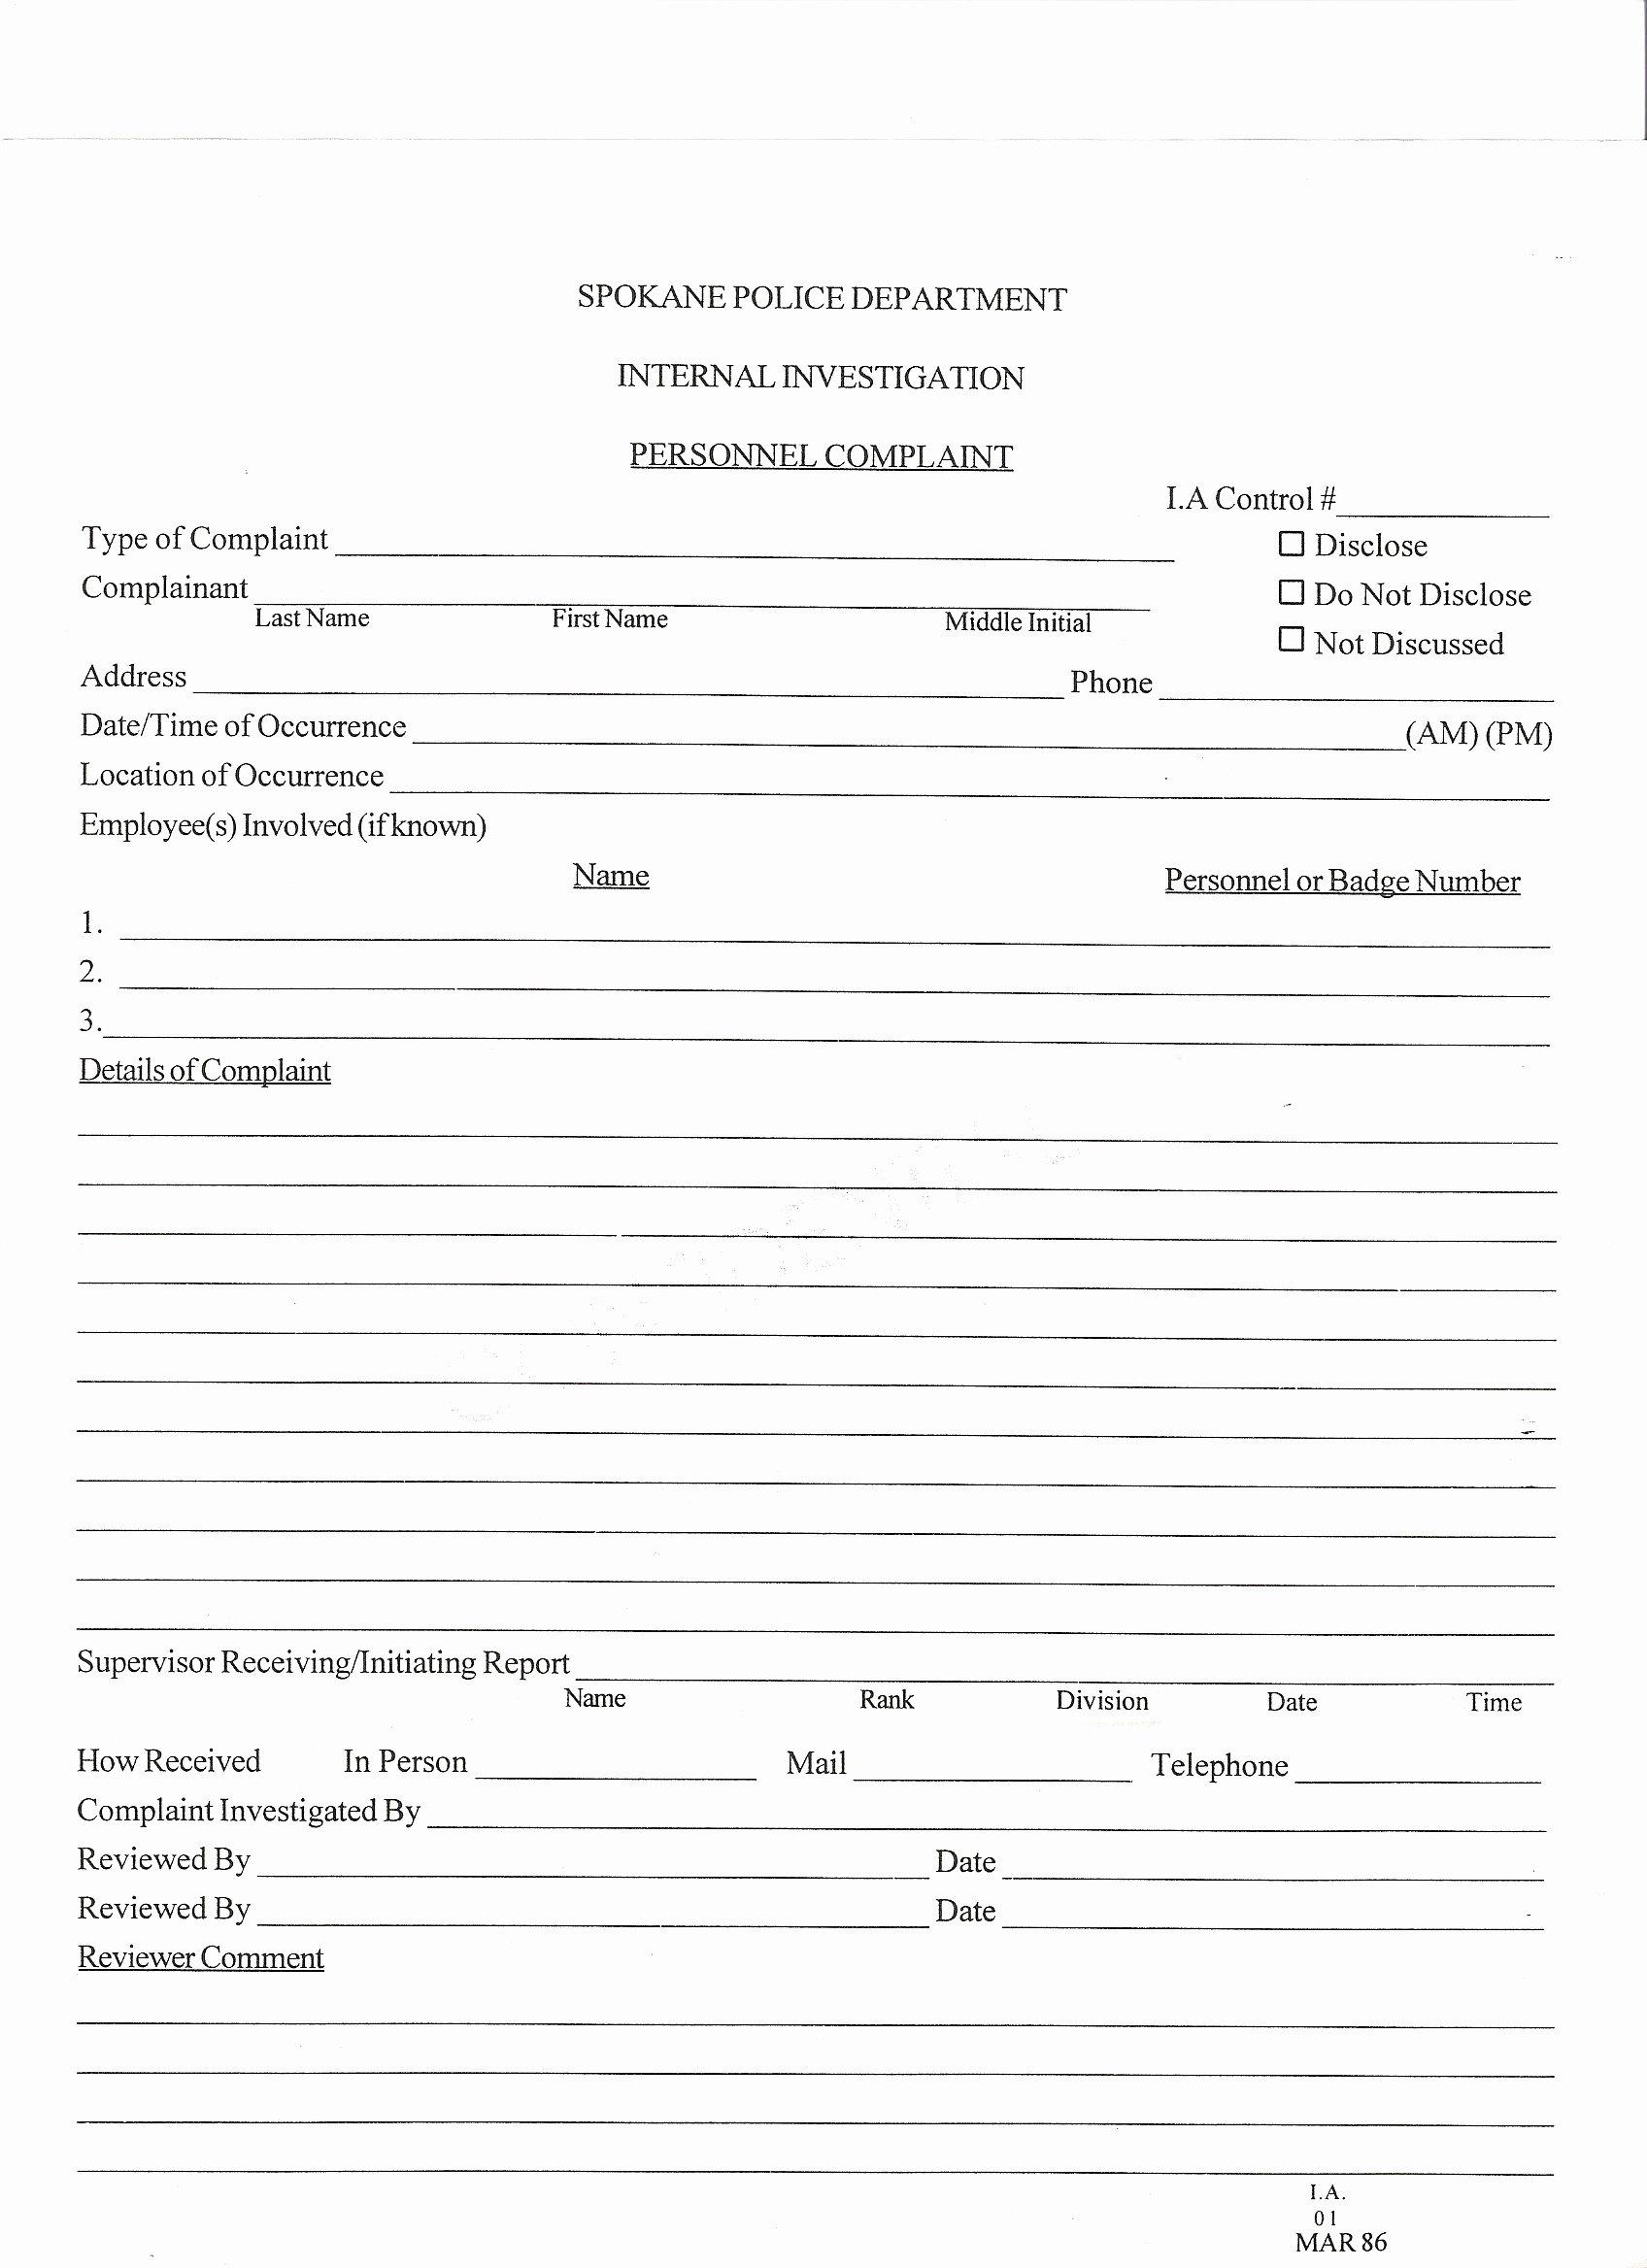 Internal Application form Awesome Spokane Police Plaint forms Spokane Police Abuses